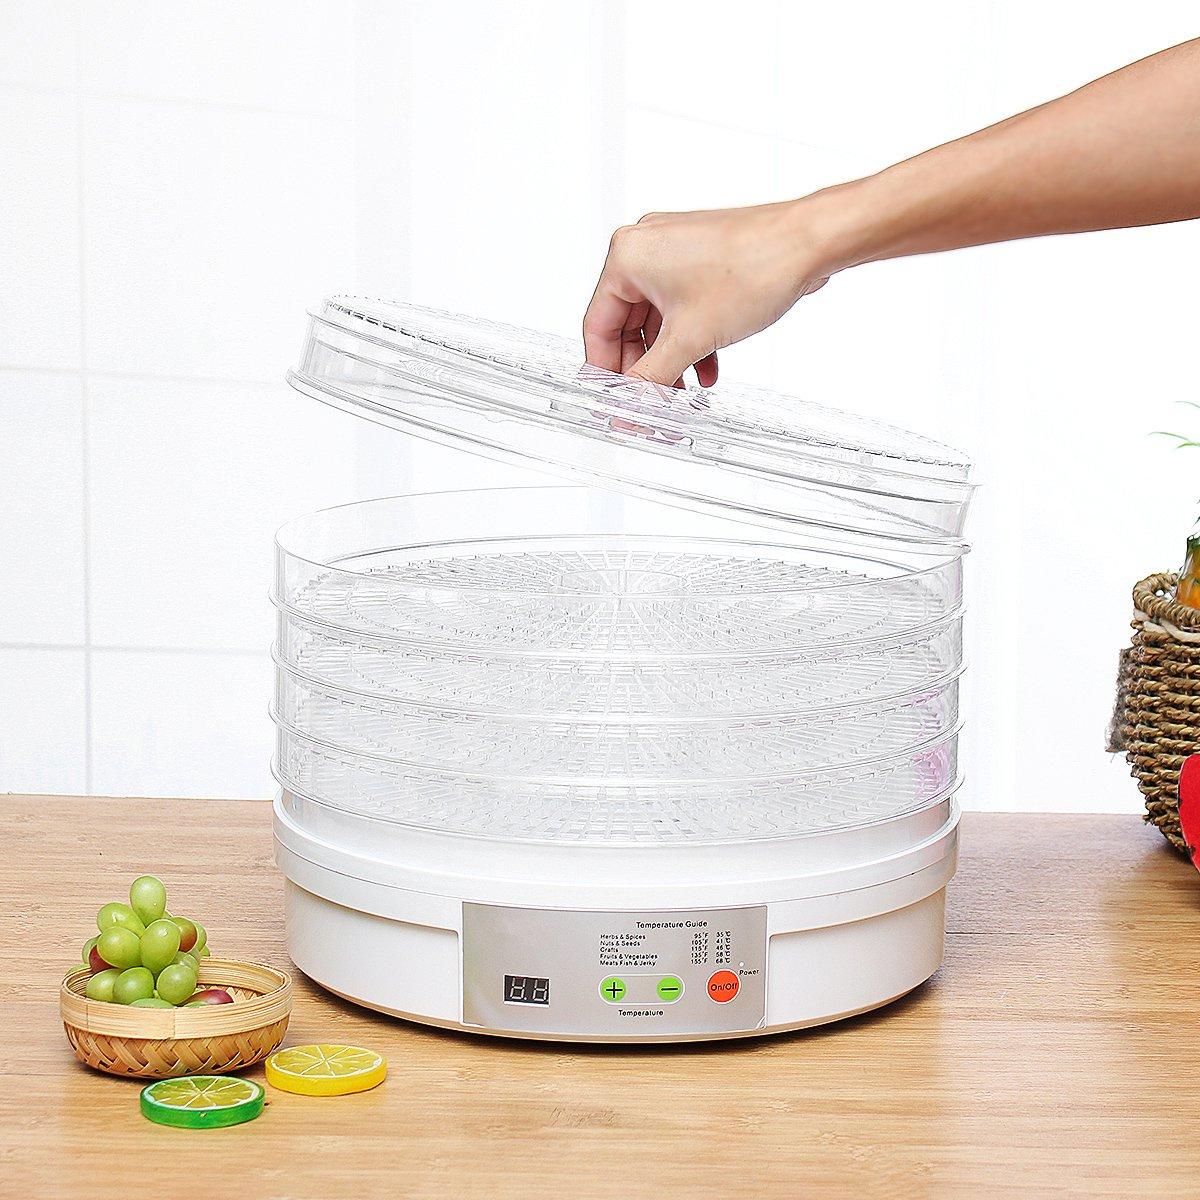 110/220V Food Grade AS Digital Food Dehydrator Fruit Vegetable Herb Meat Drying Machine Food Dryer Dried Fruit Machine 5 Trays